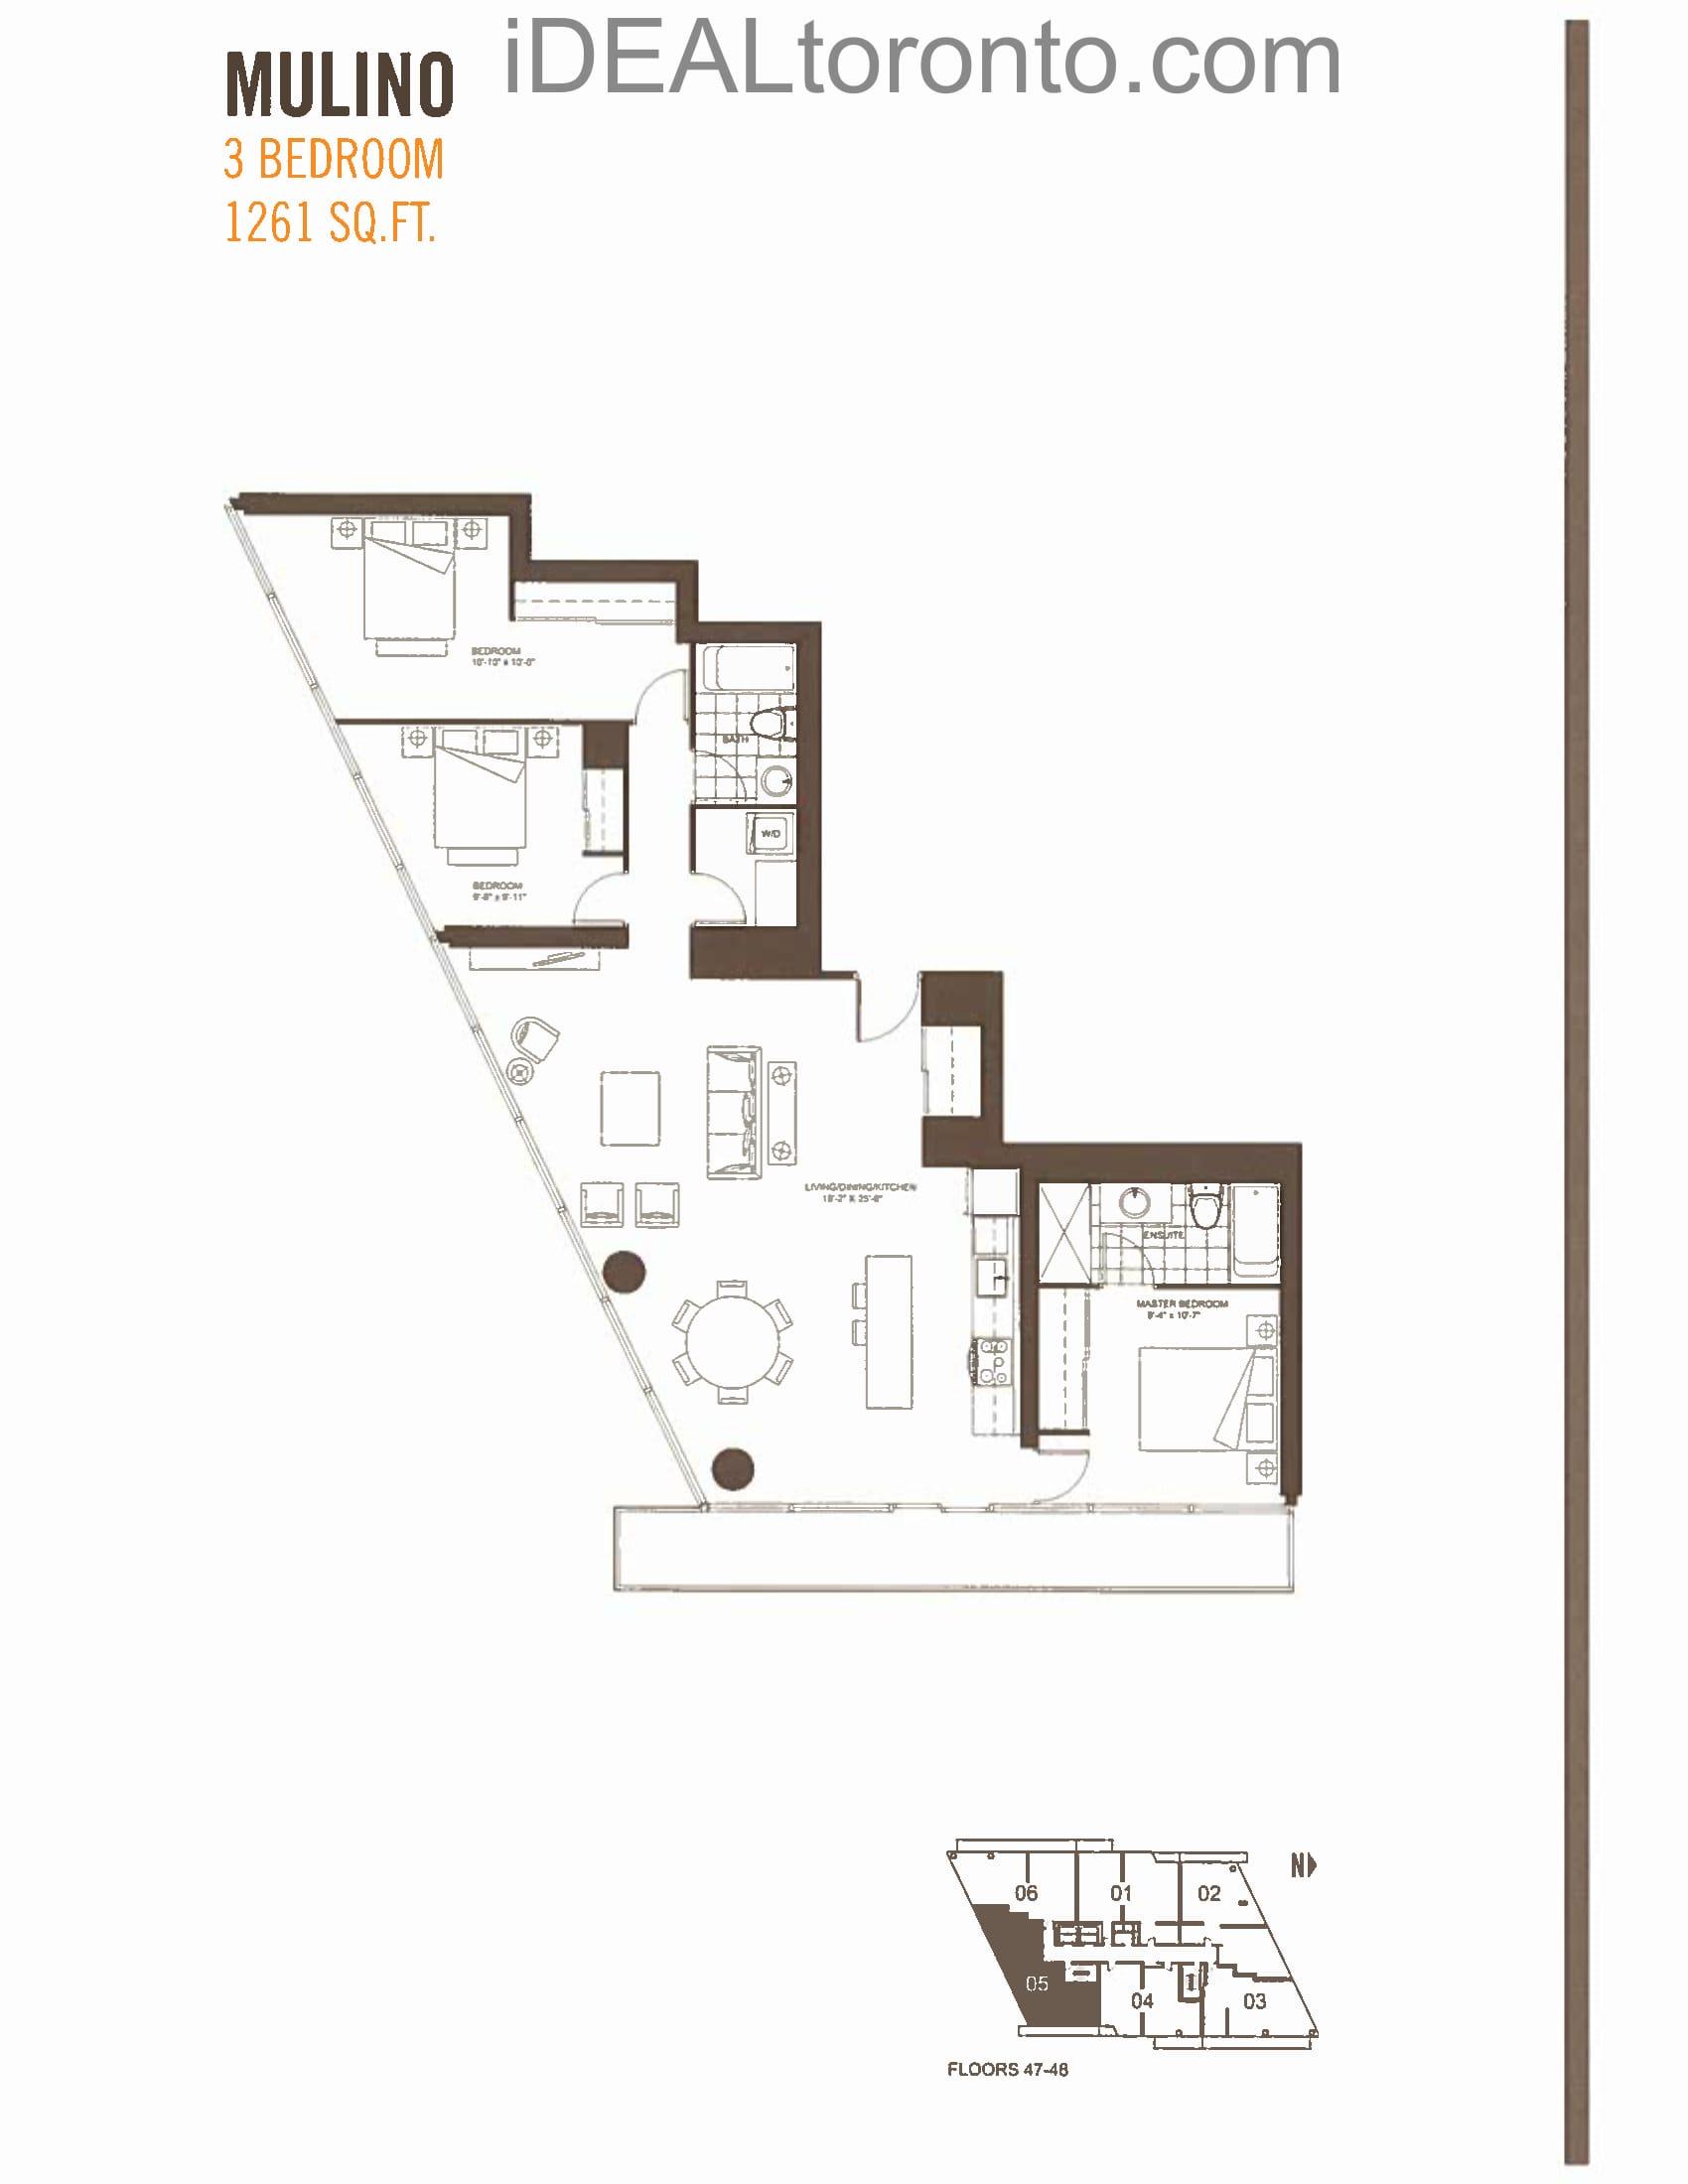 Mulino: 3 Bedroom,SE, 1261 SqFt